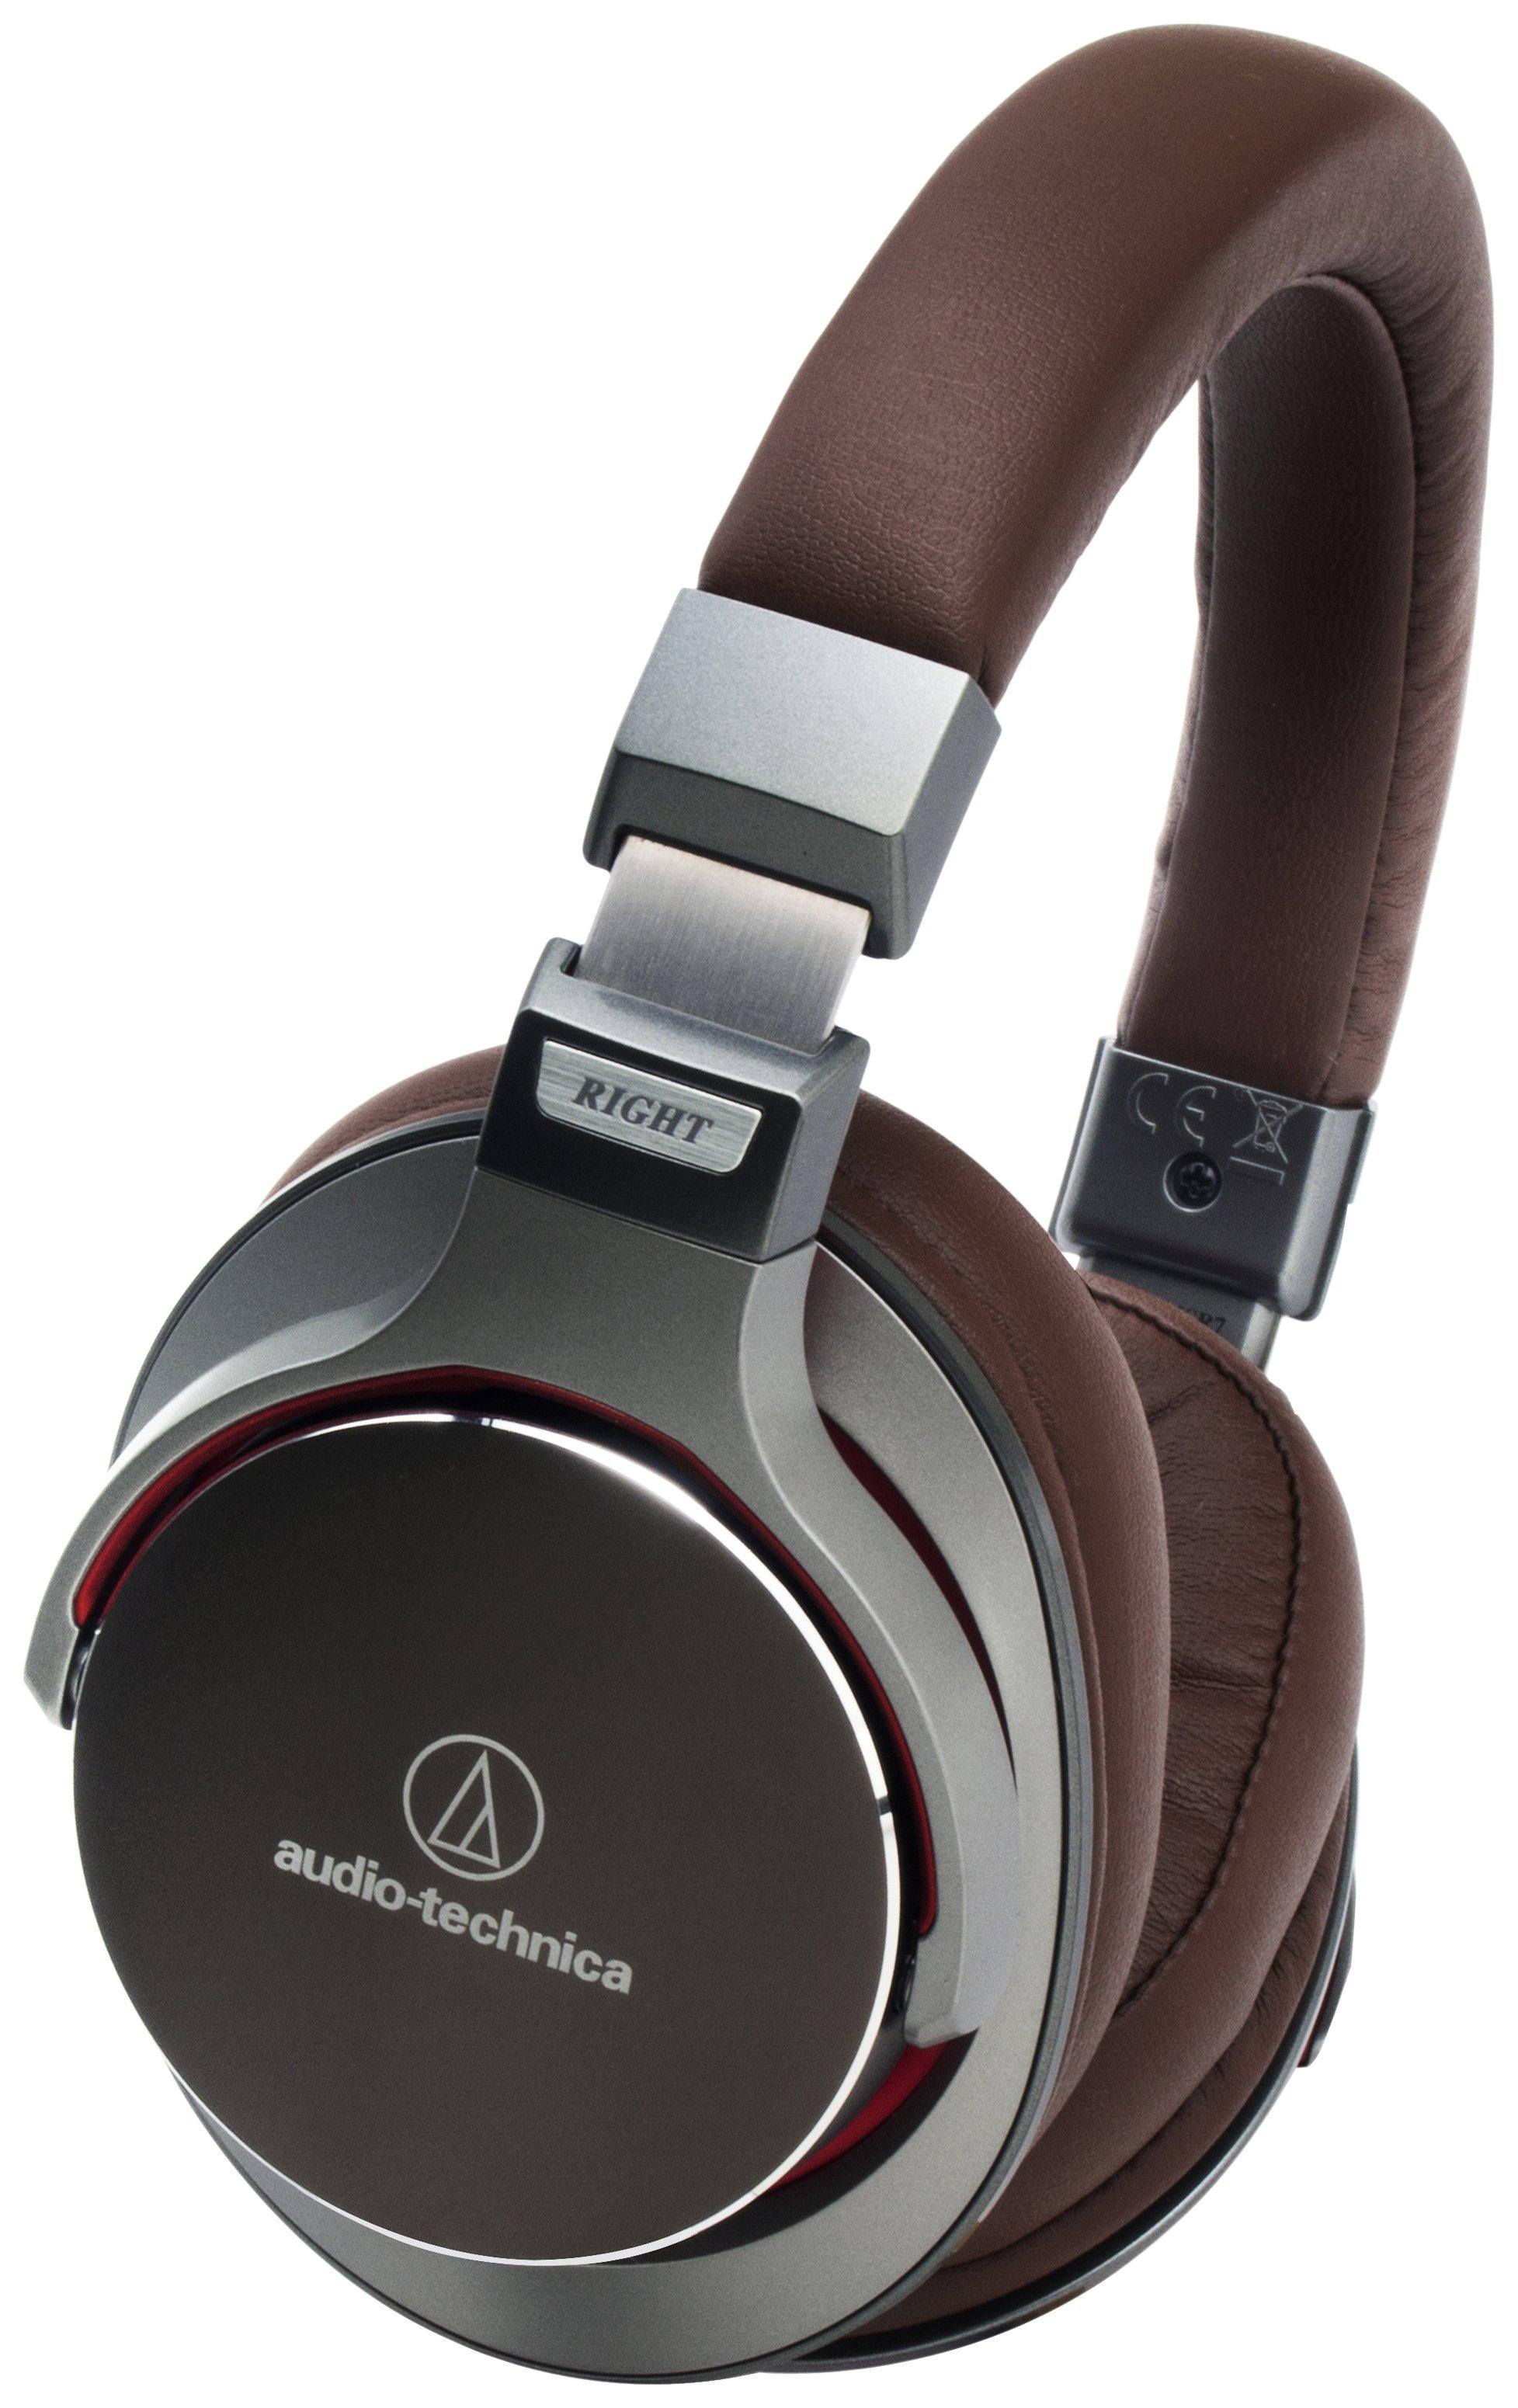 Image of Audio Technica ATH-MSR7GM On-Ear Headphones - Gunmetal Grey.